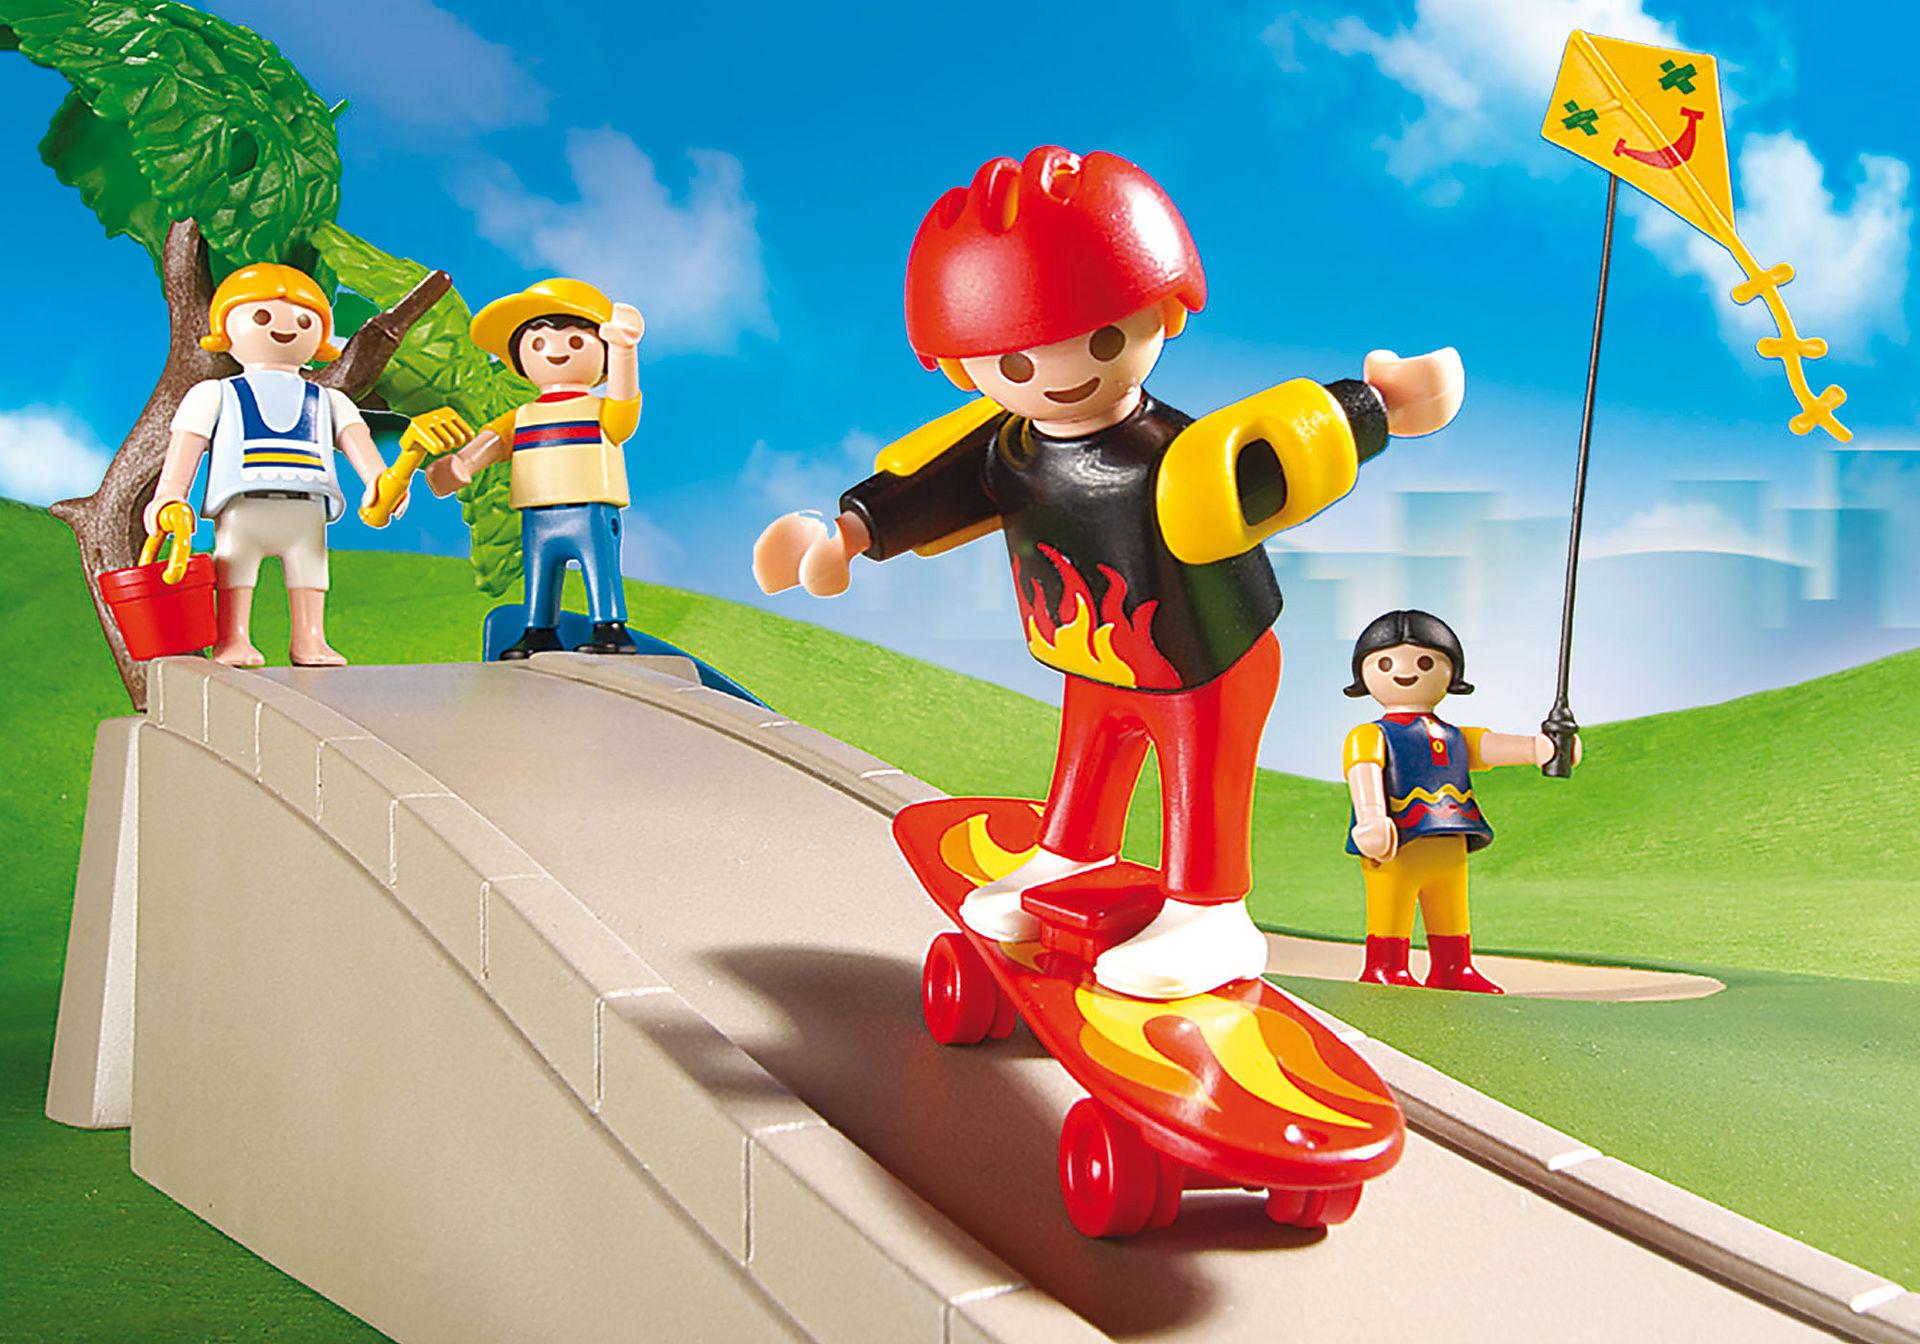 http://media.playmobil.com/i/playmobil/4132_product_extra1/Superset enfant / aire de jeux